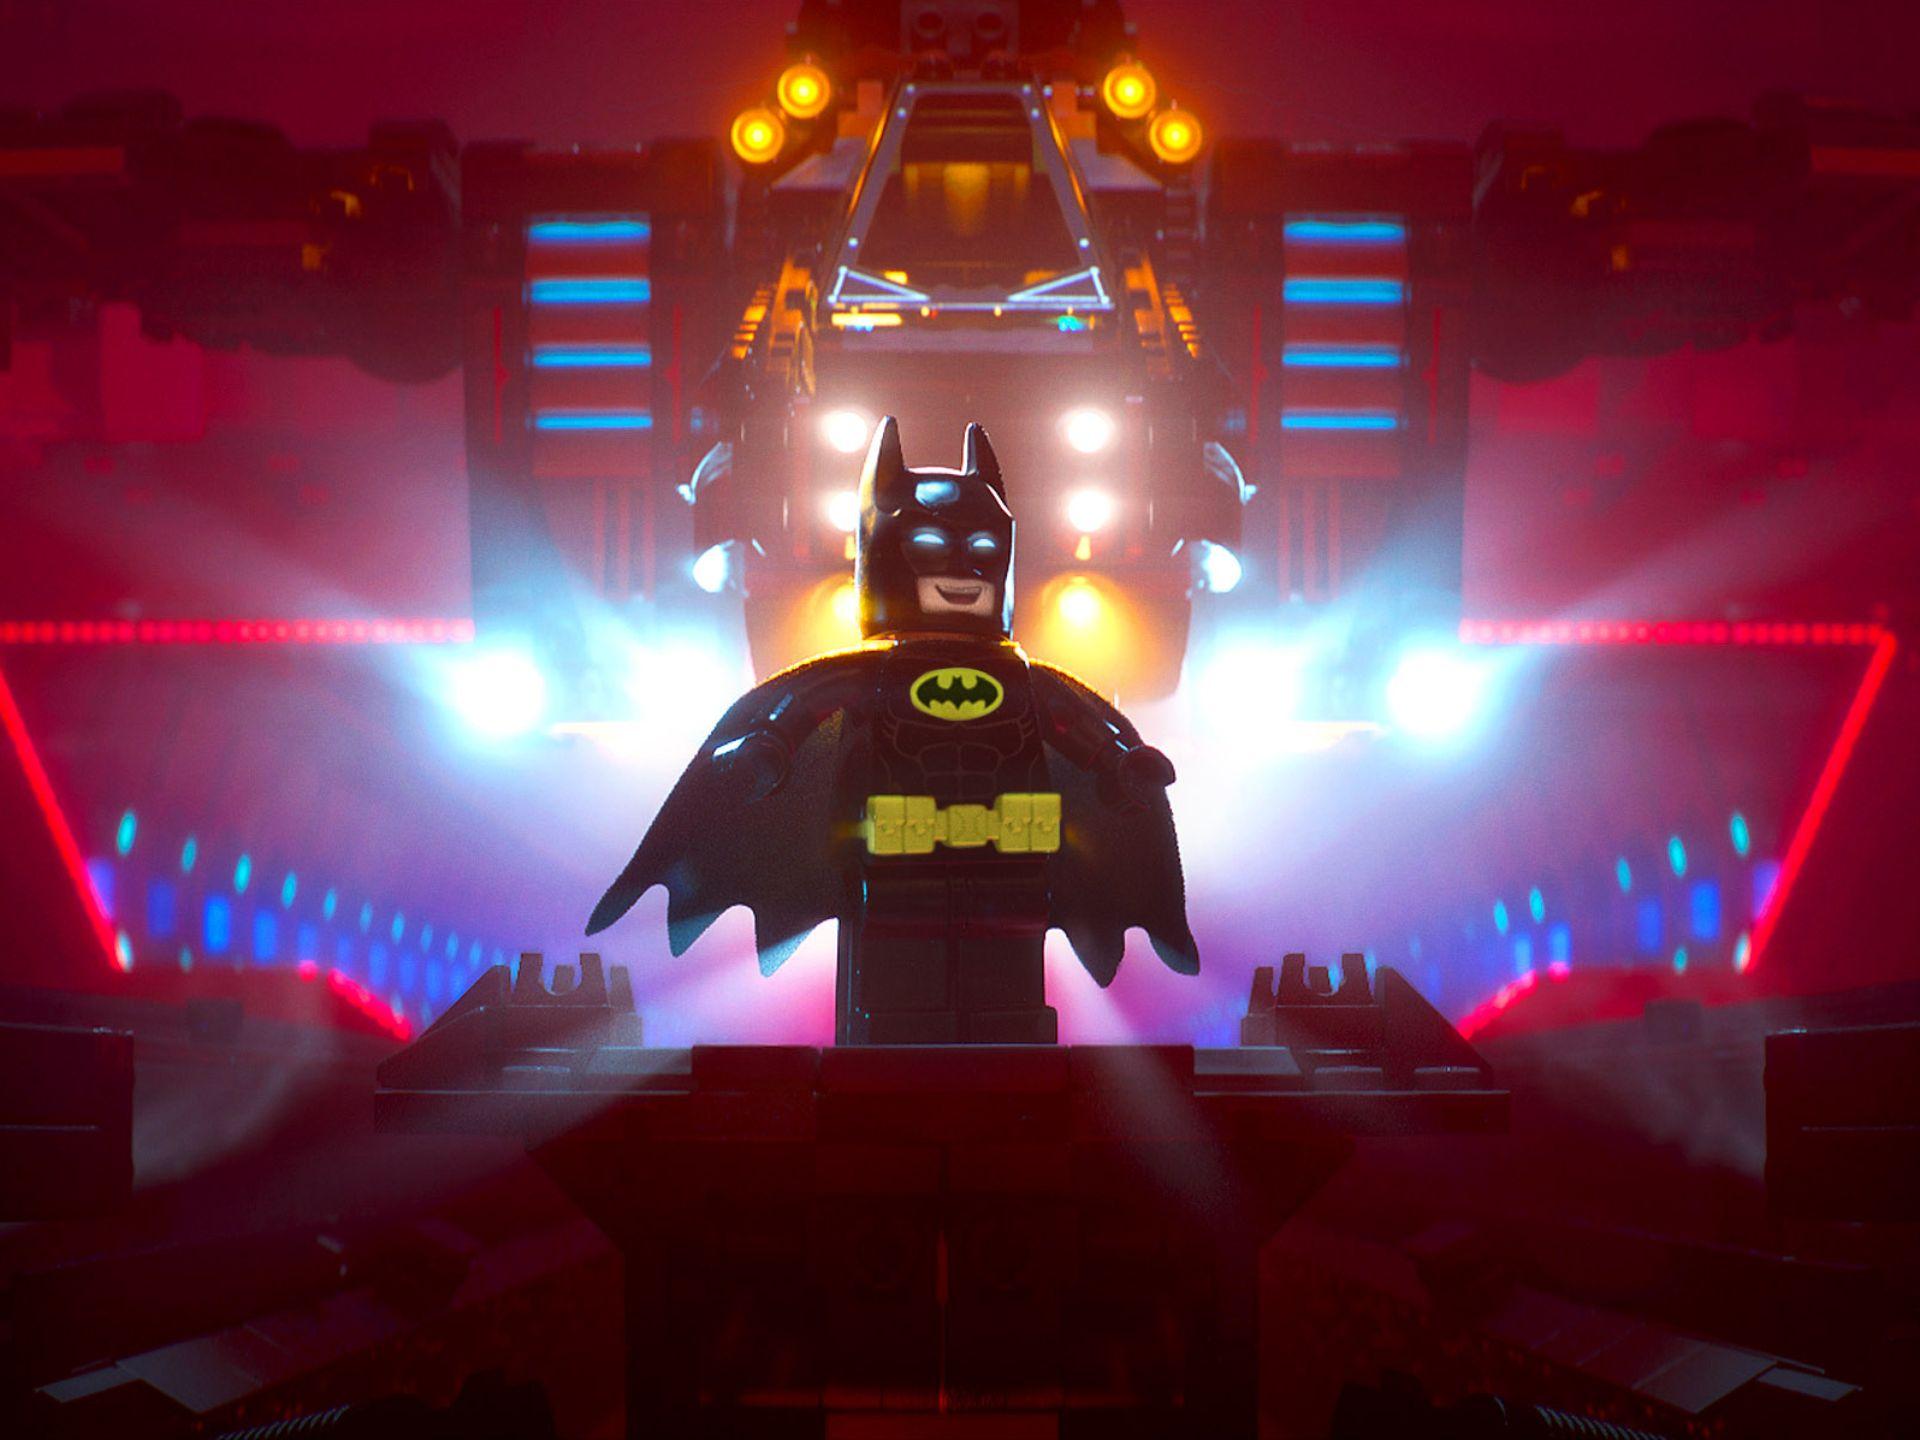 The Lego Batman Movie Trailer